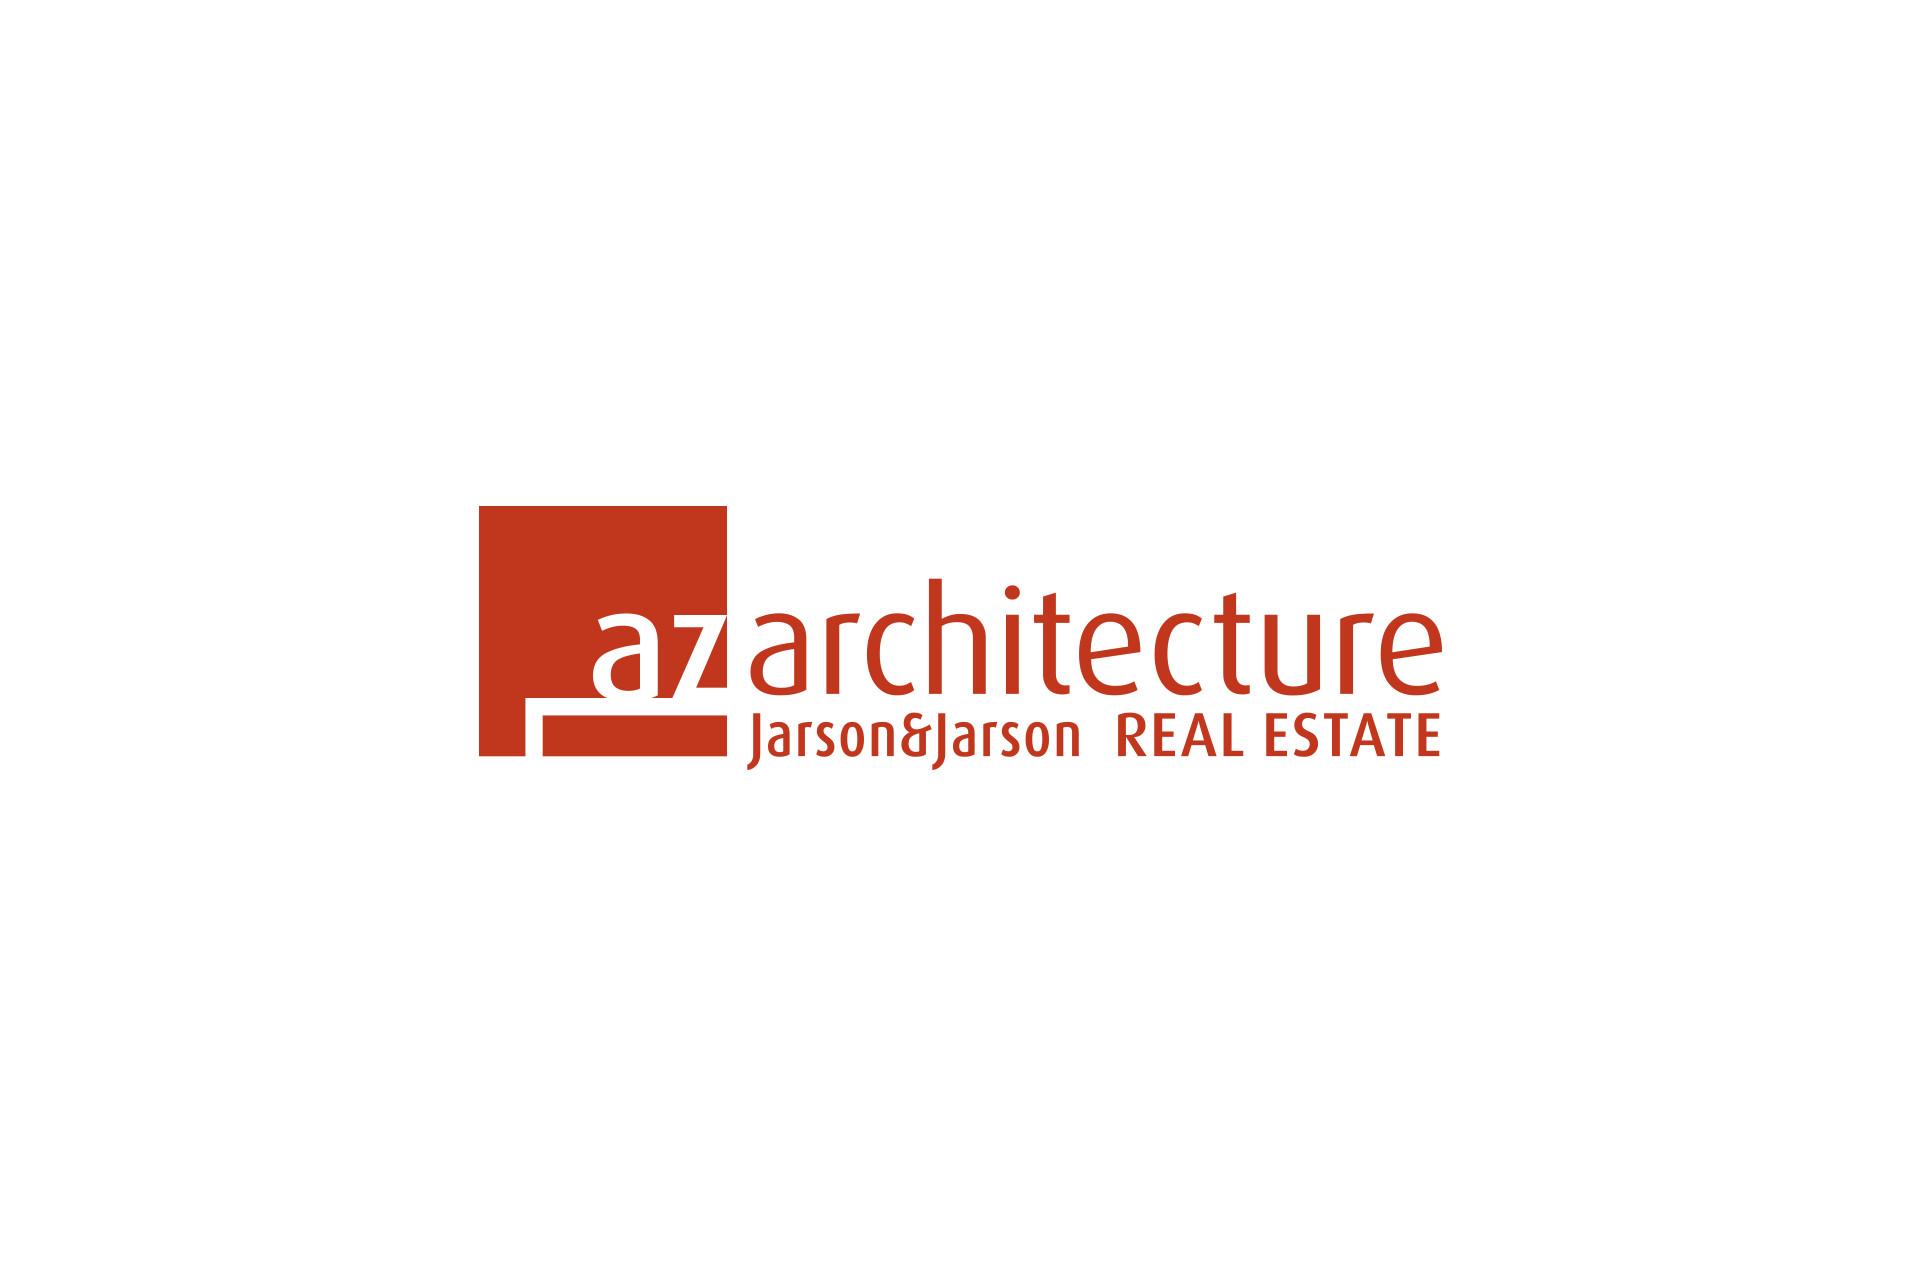 azarchitecture jarson u0026jarson